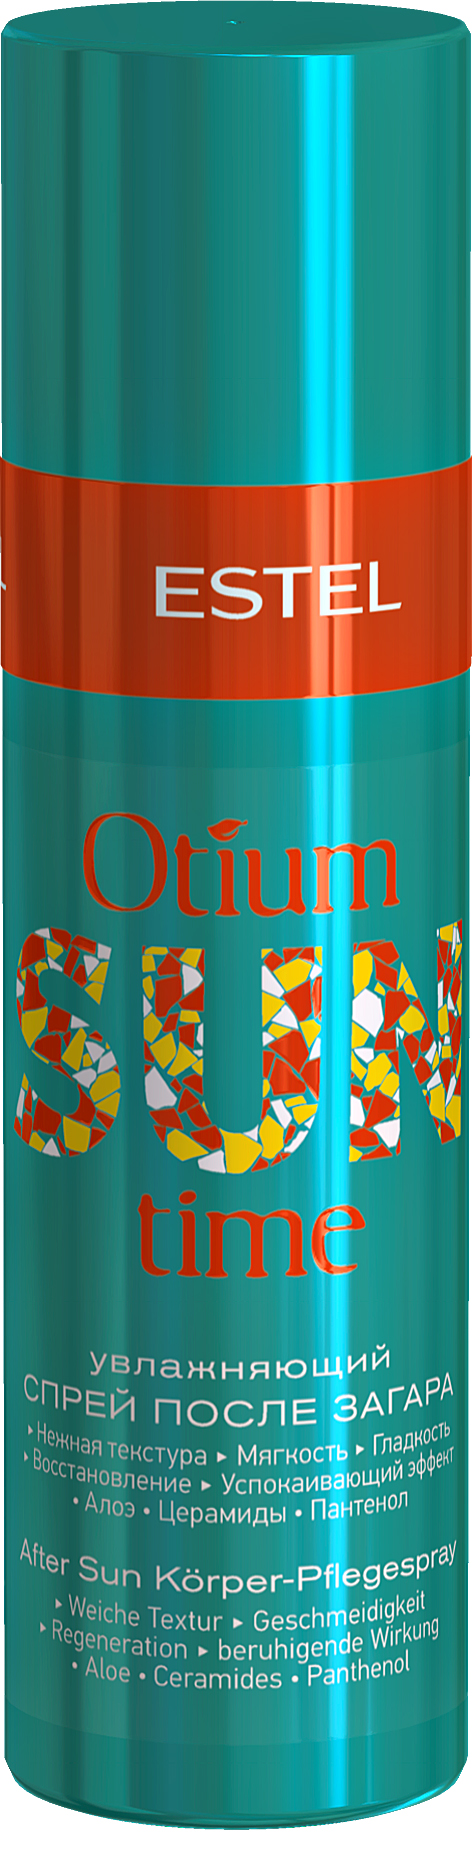 ESTEL PROFESSIONAL Спрей увлажняющий для тела после загара / OTIUM SUN TIME 100 мл